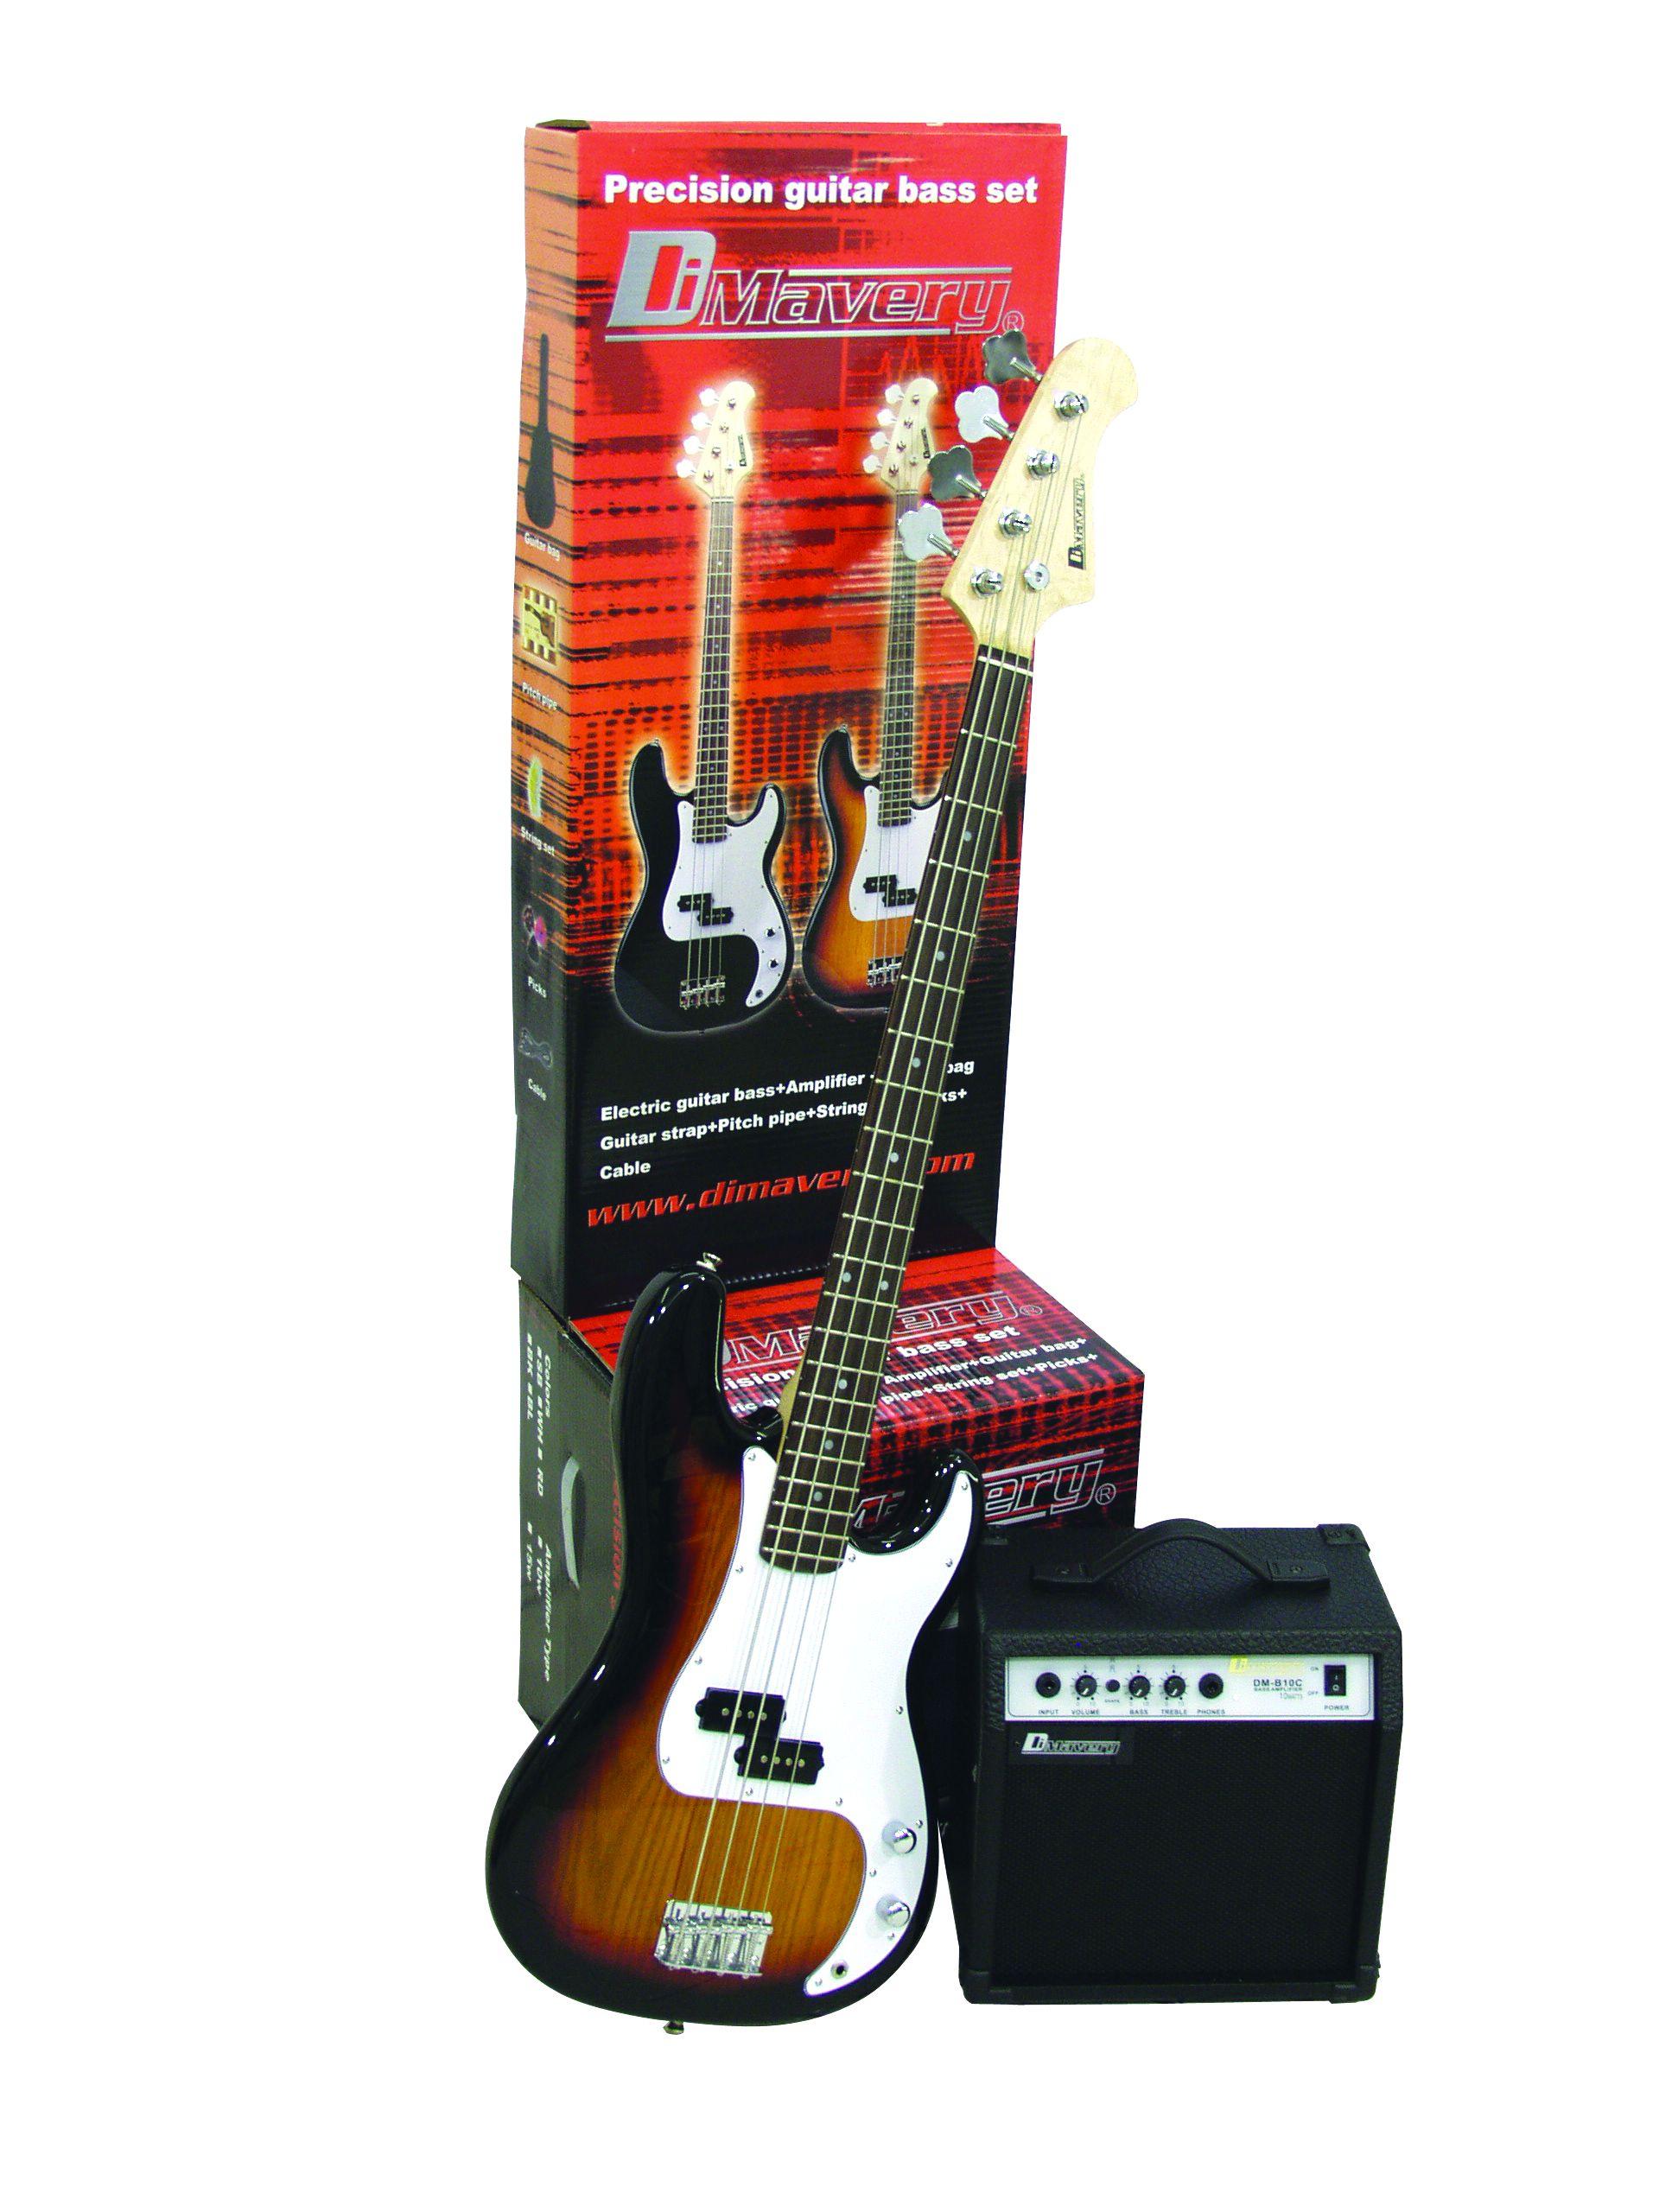 dimavery bgs10 electric bass guitar and amp set with bag sunburst bass guitars. Black Bedroom Furniture Sets. Home Design Ideas